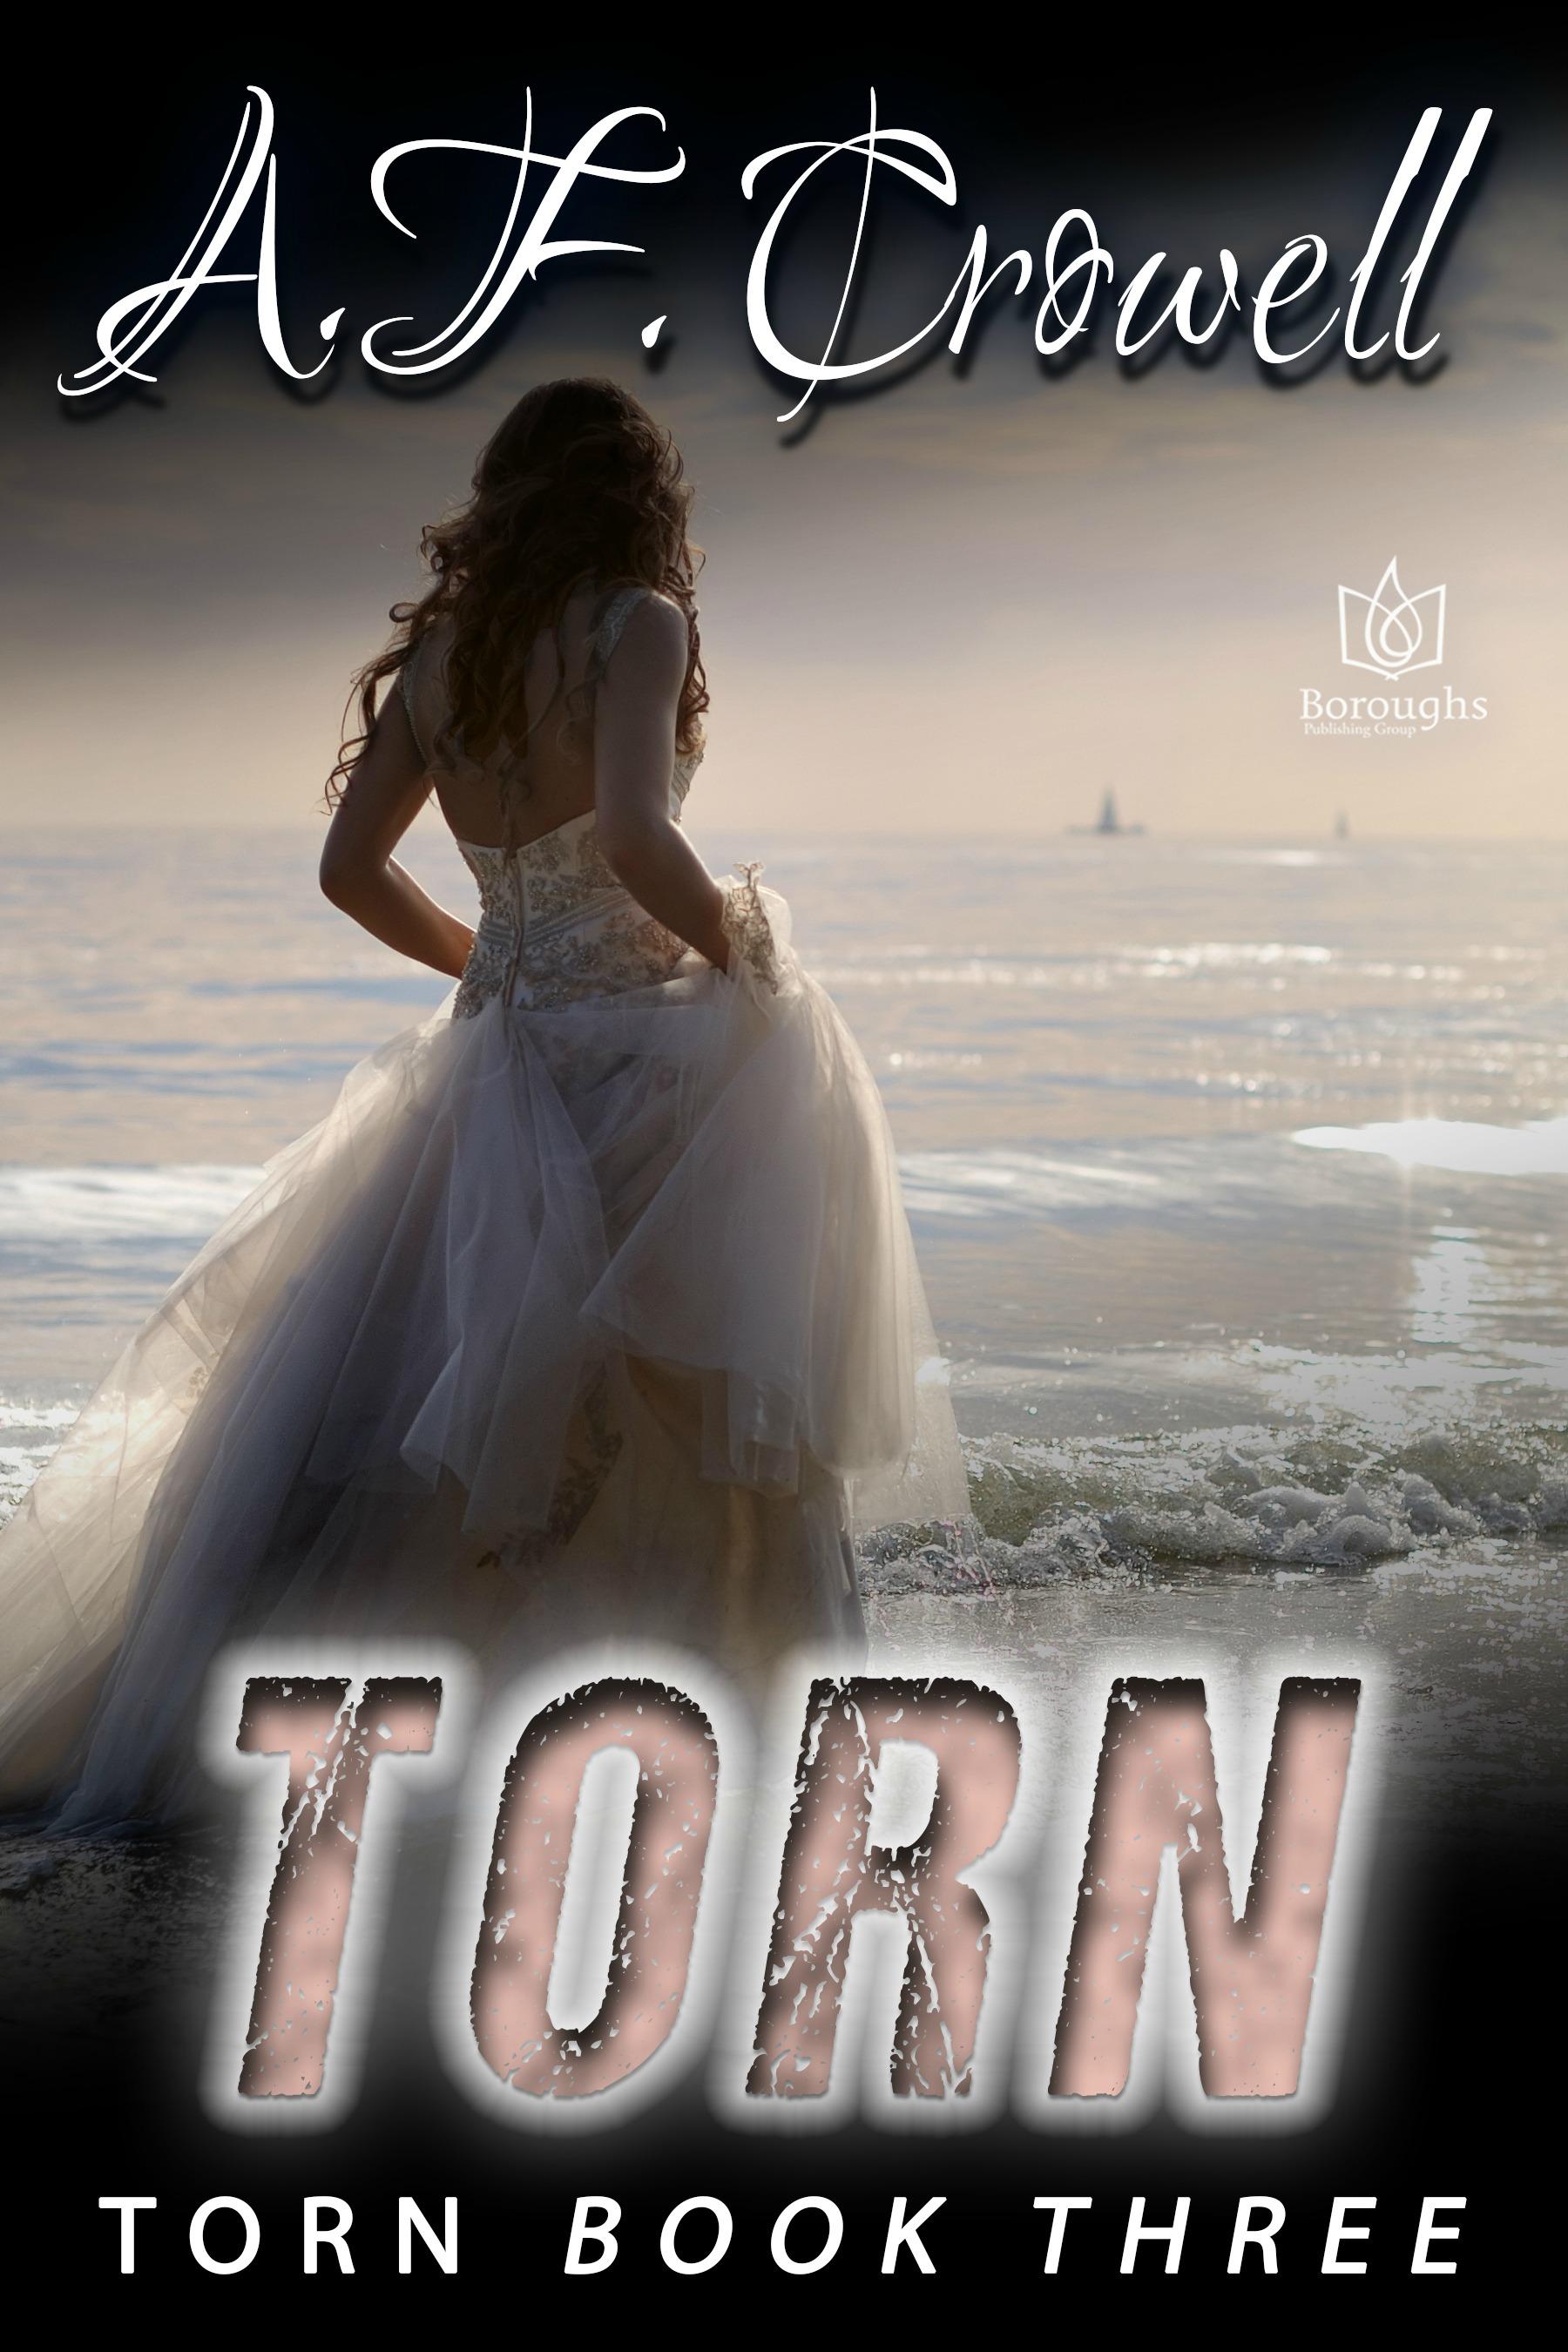 Torn Ebook Cover.jpg